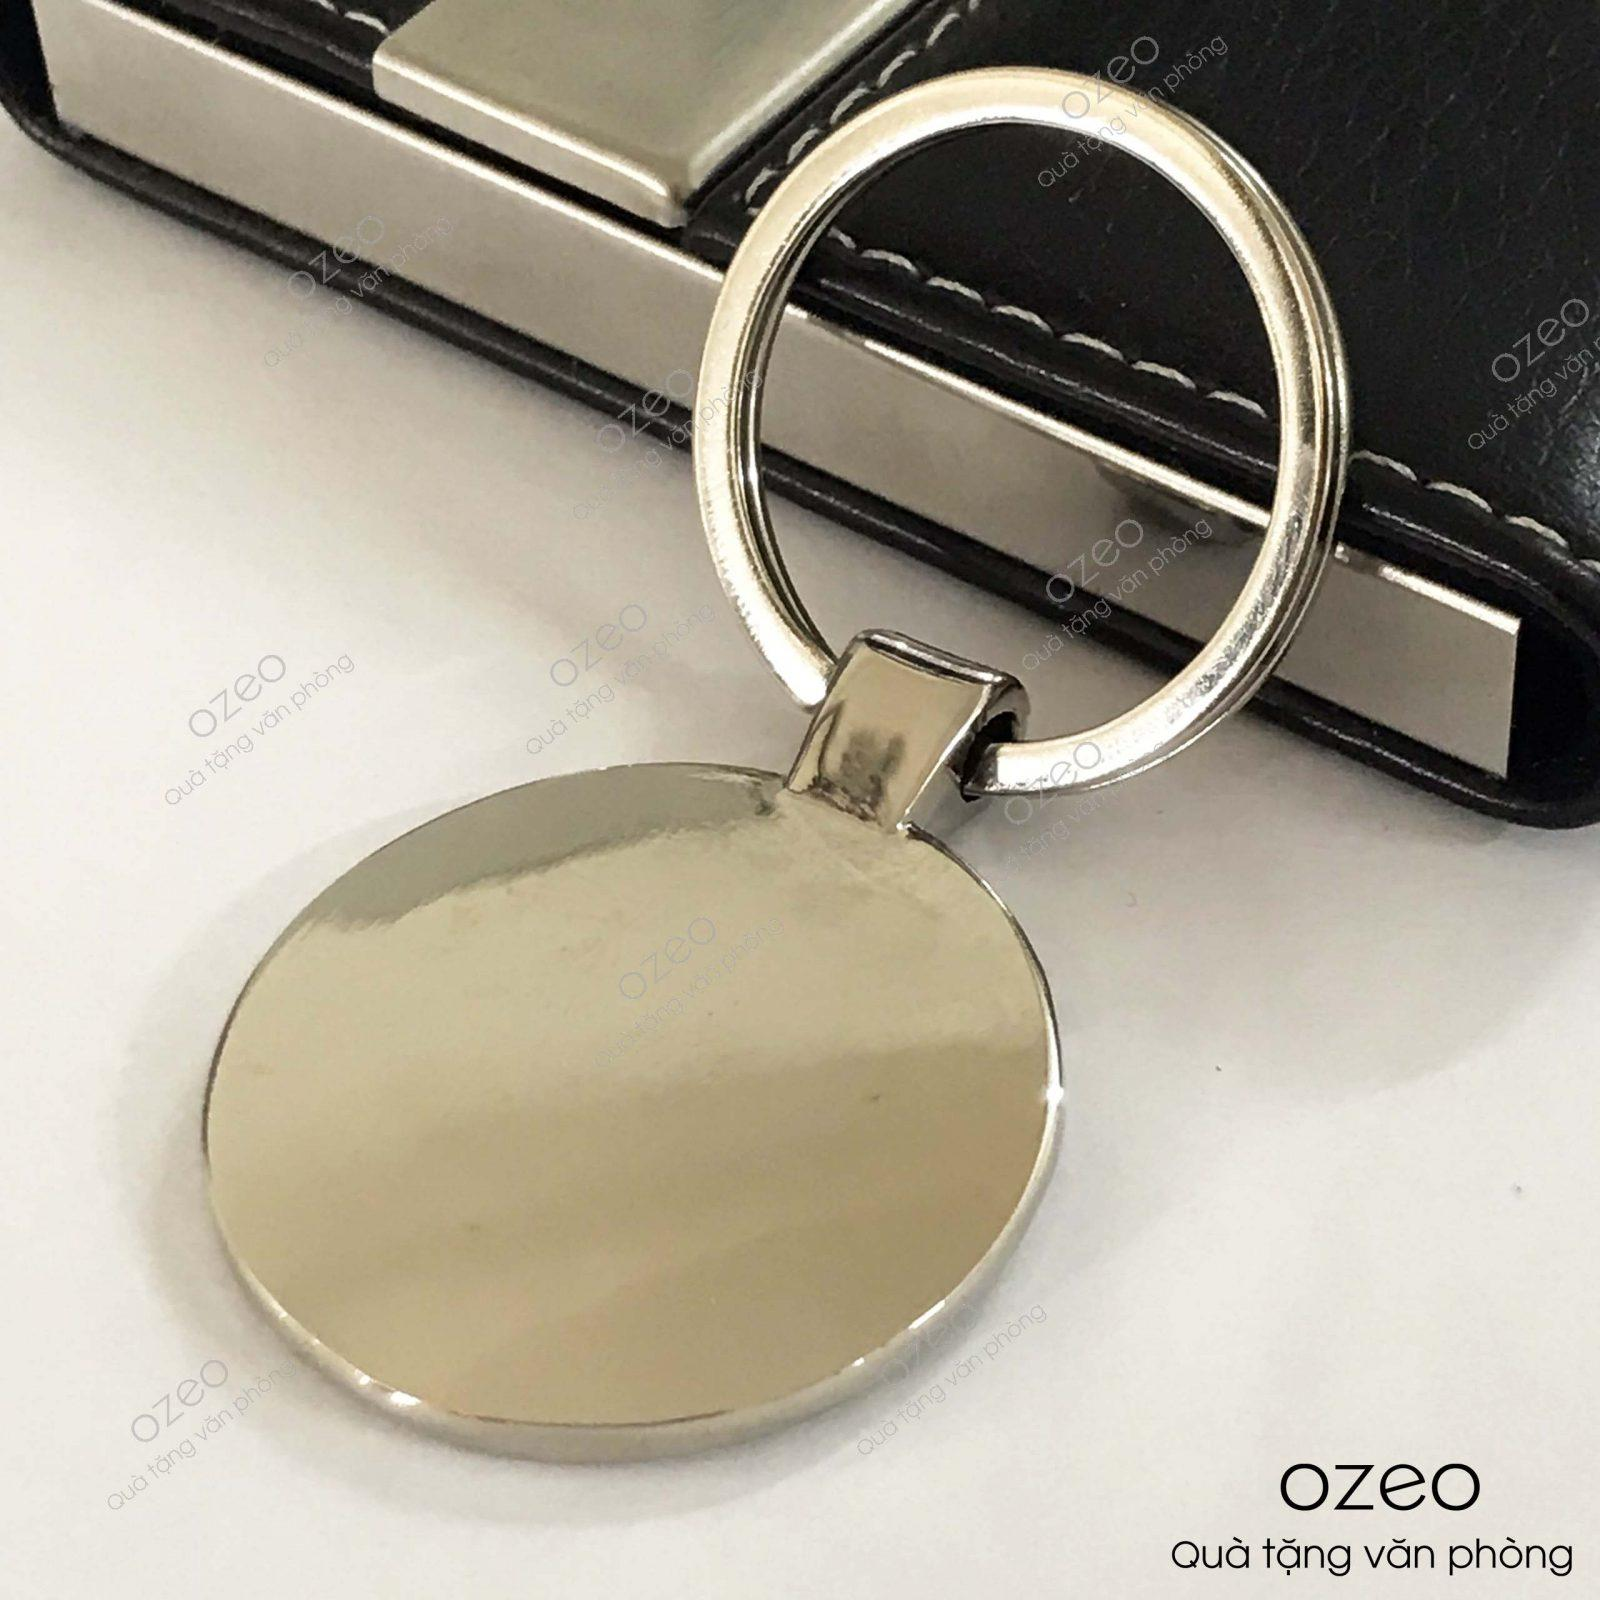 Mặt sau của móc khóa kim loại tròn MK001.